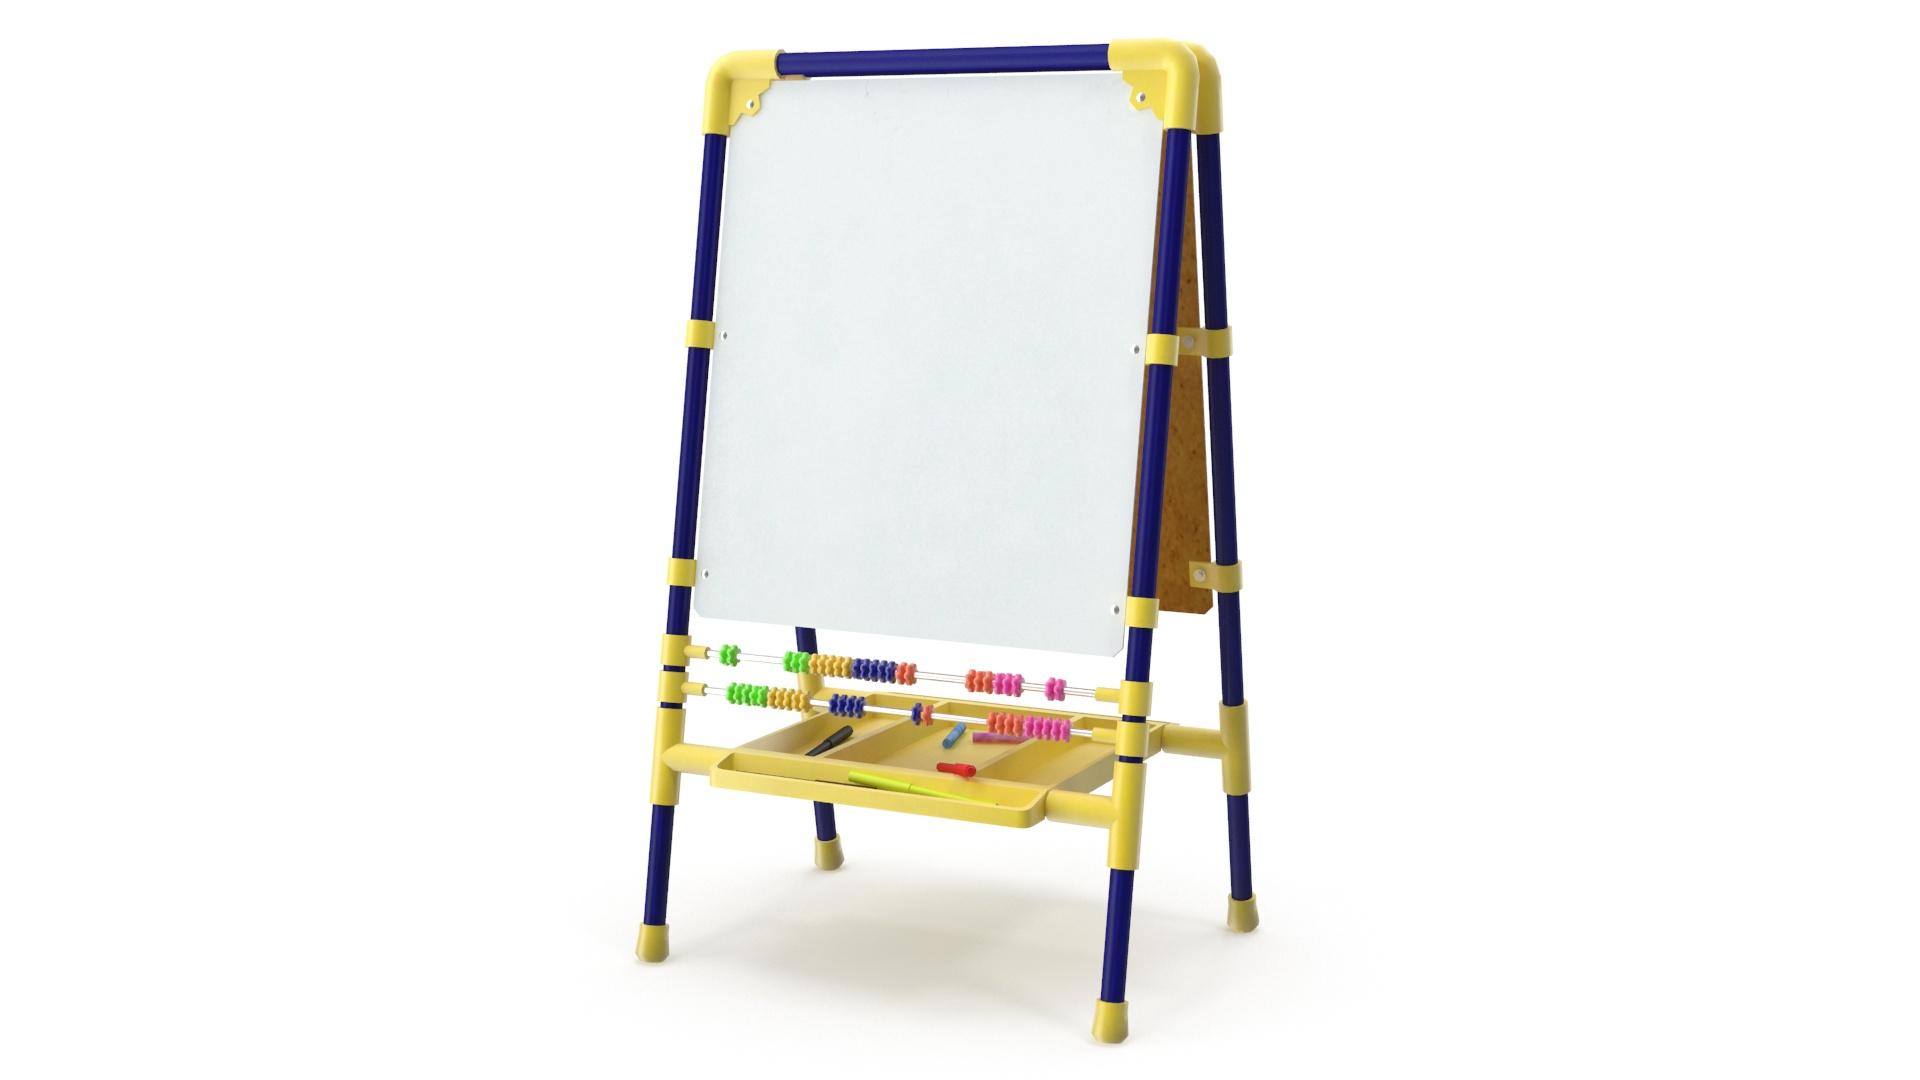 childrens drawing board 3d model 3ds max fbx obj 263603